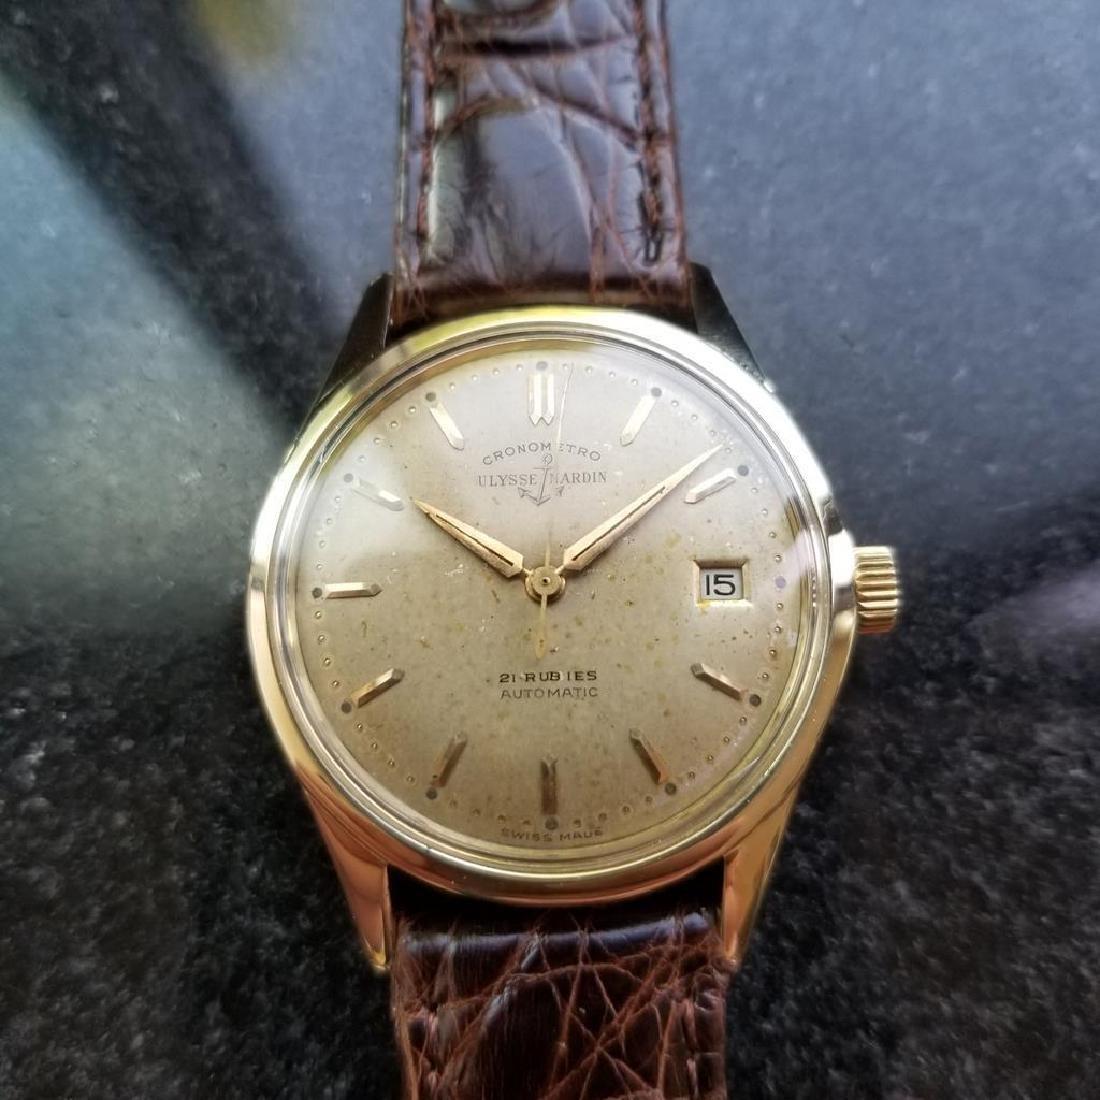 Vintage ULYSSE NARDIN Chronometer Automatic w/ date - 3